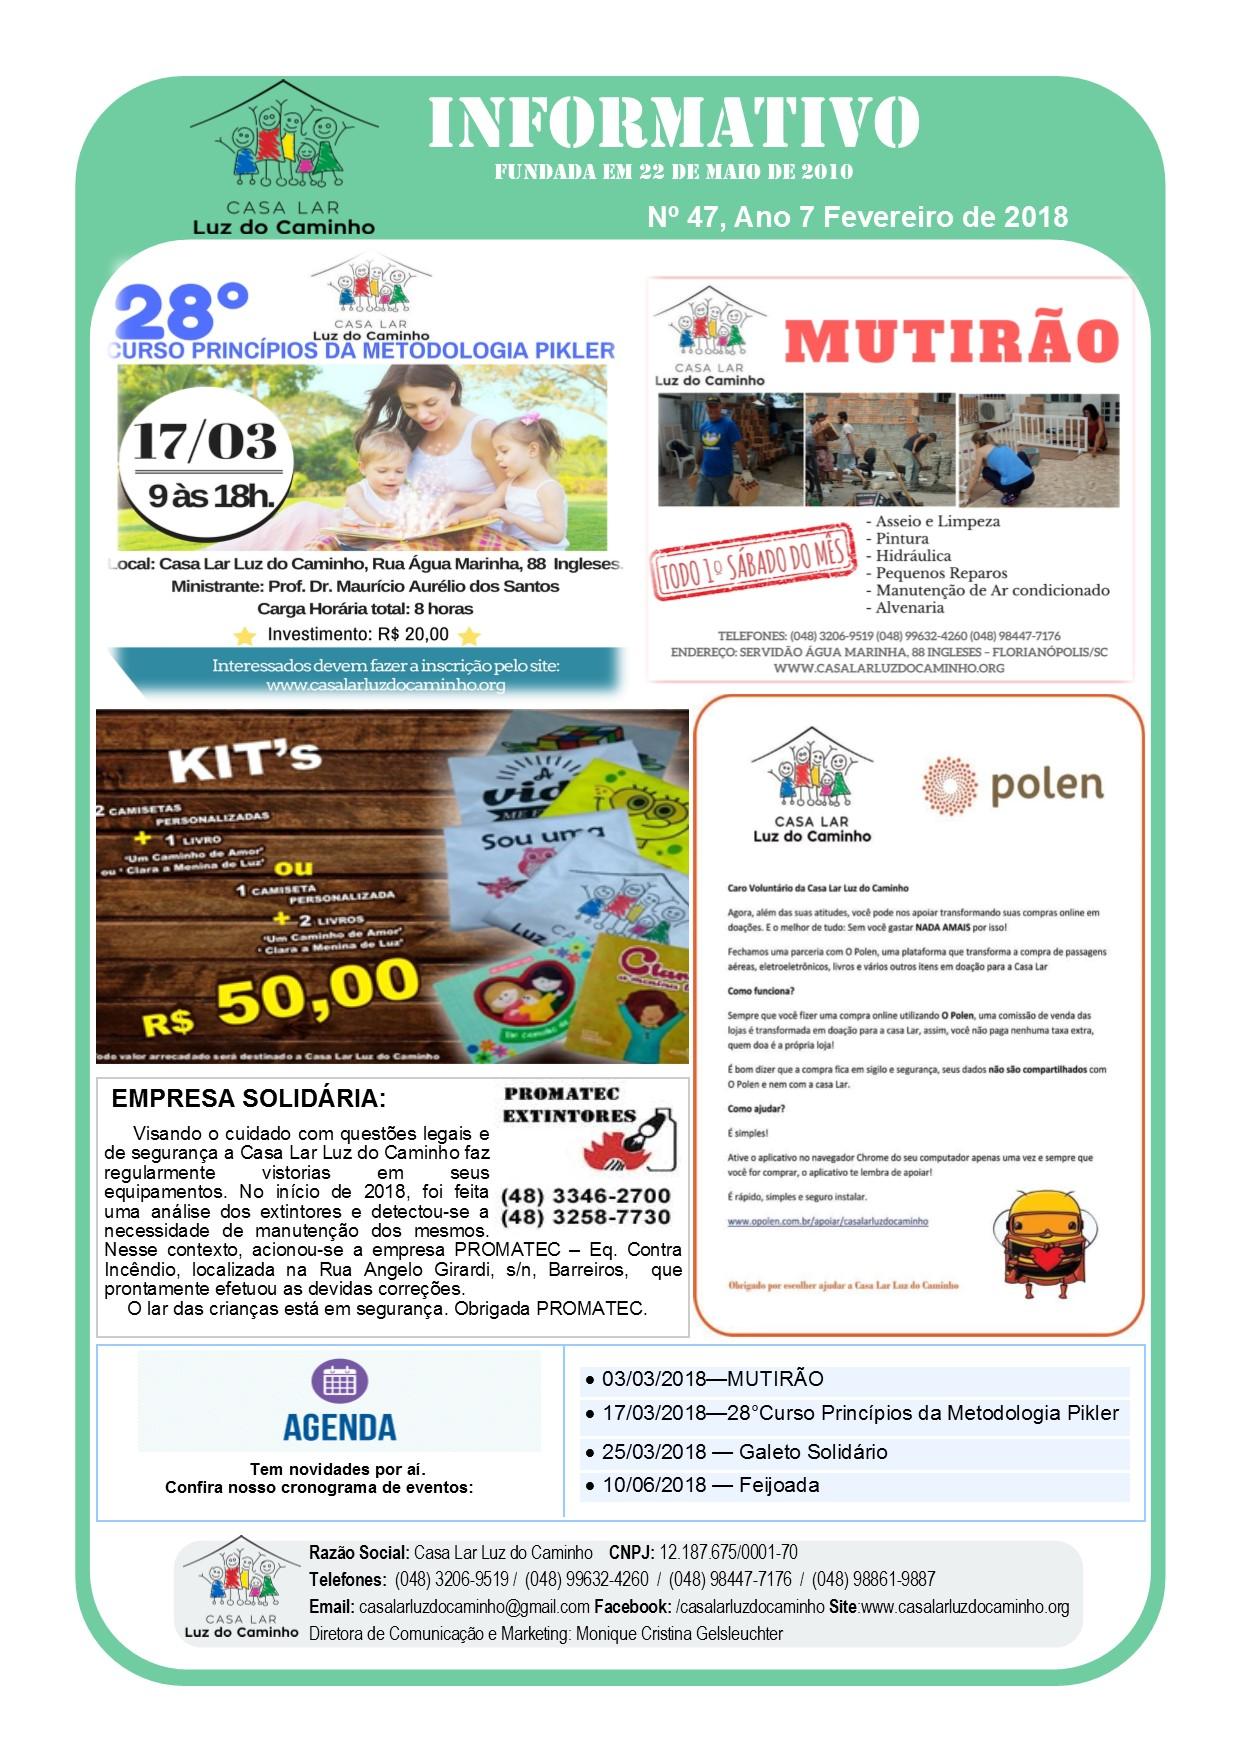 Informativo 02/18